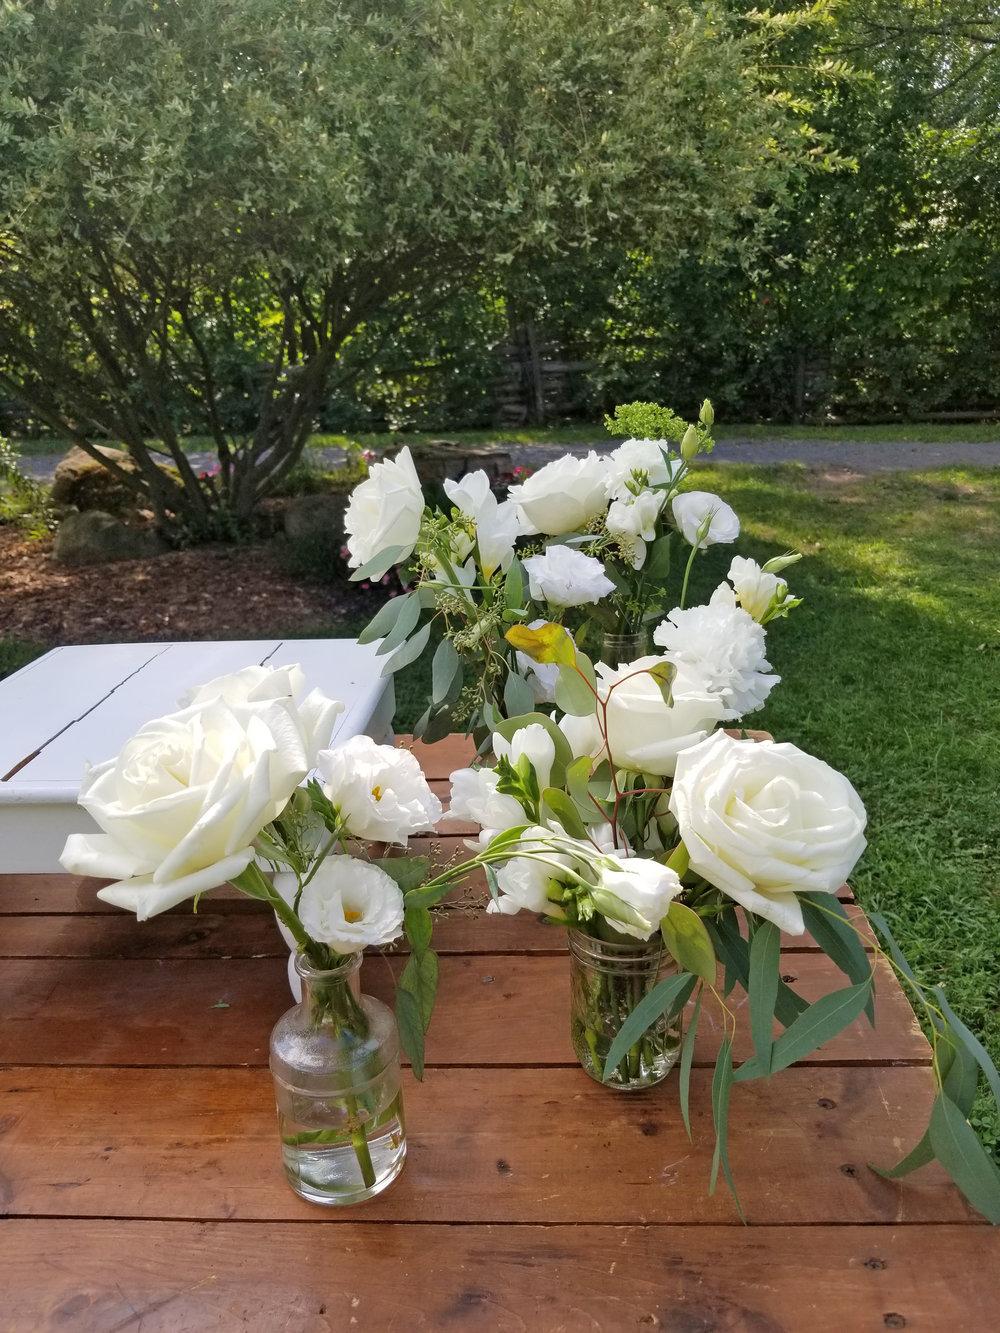 Natural Organic Montreal Wedding Pointe du Moulin Florist Flowers 20180819_154302.jpg